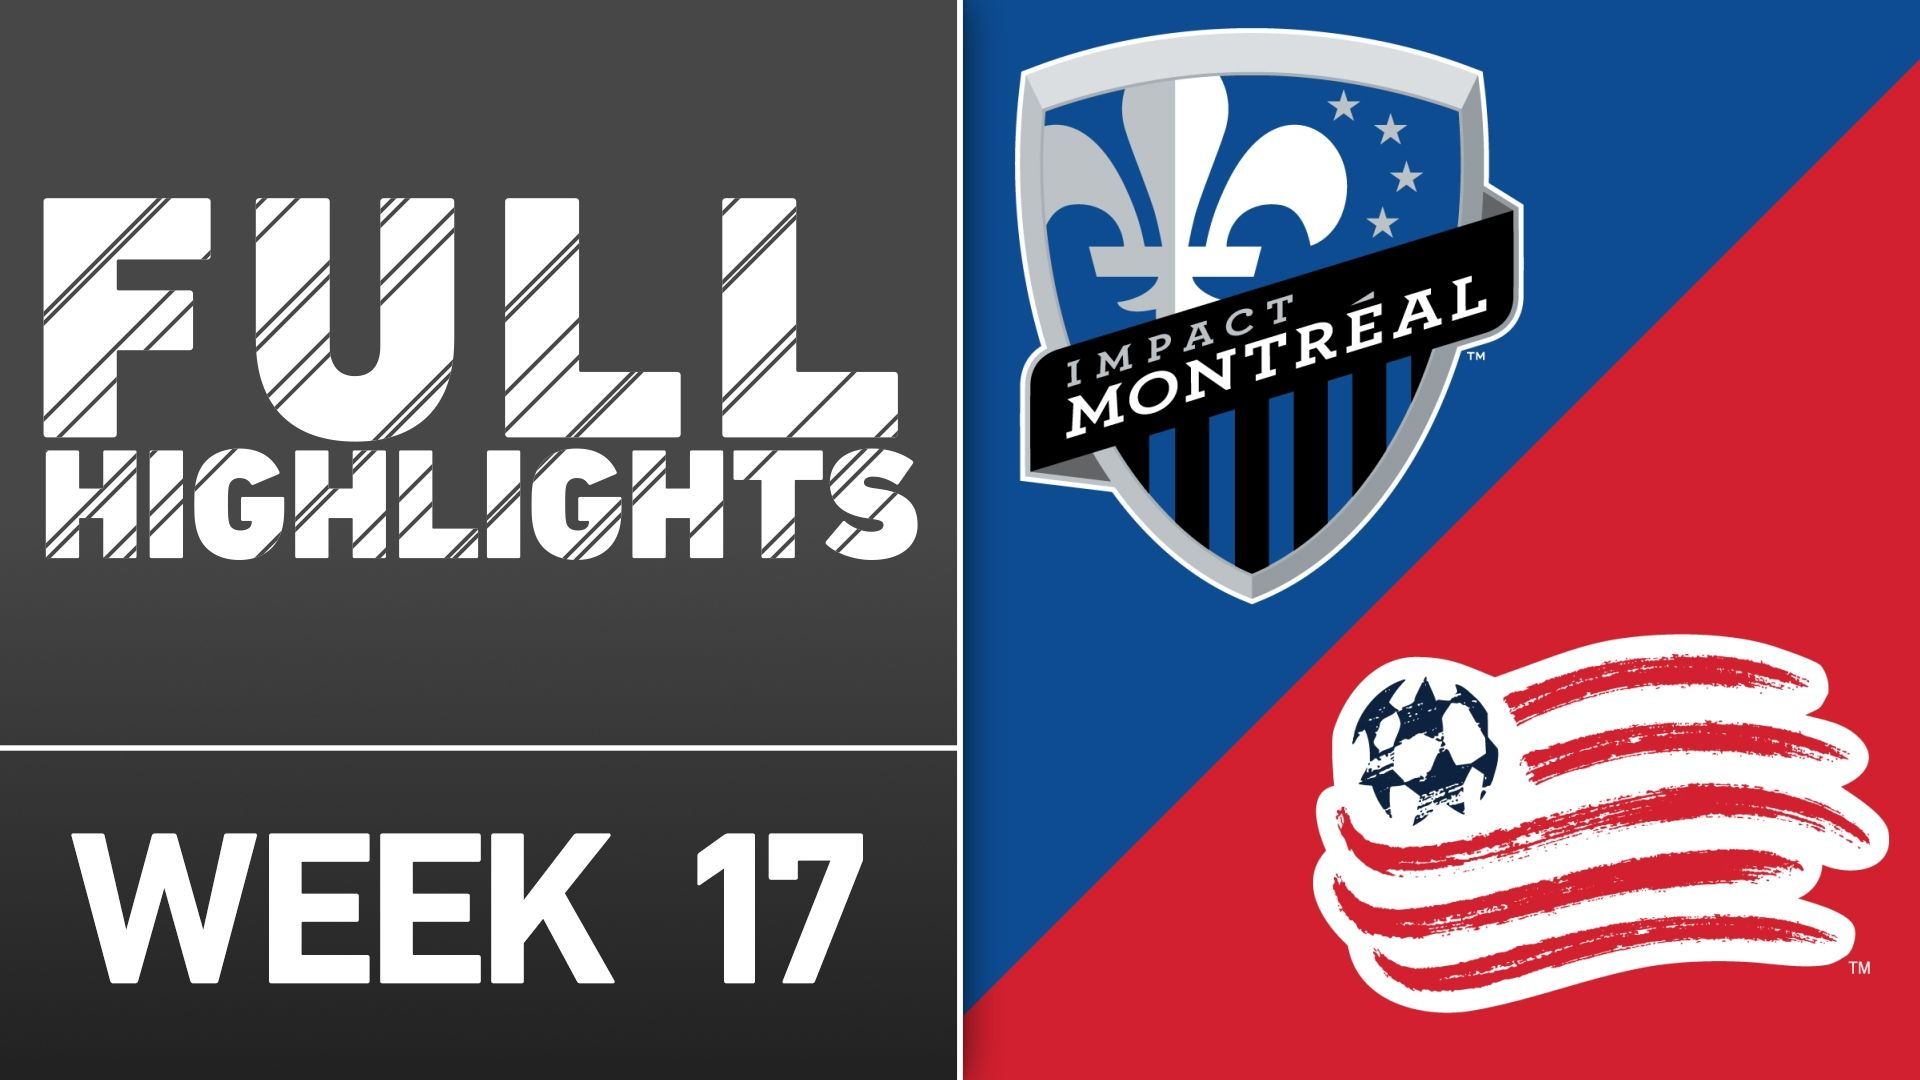 Video via MLS: Montreal Impact 3-2 New England Revs